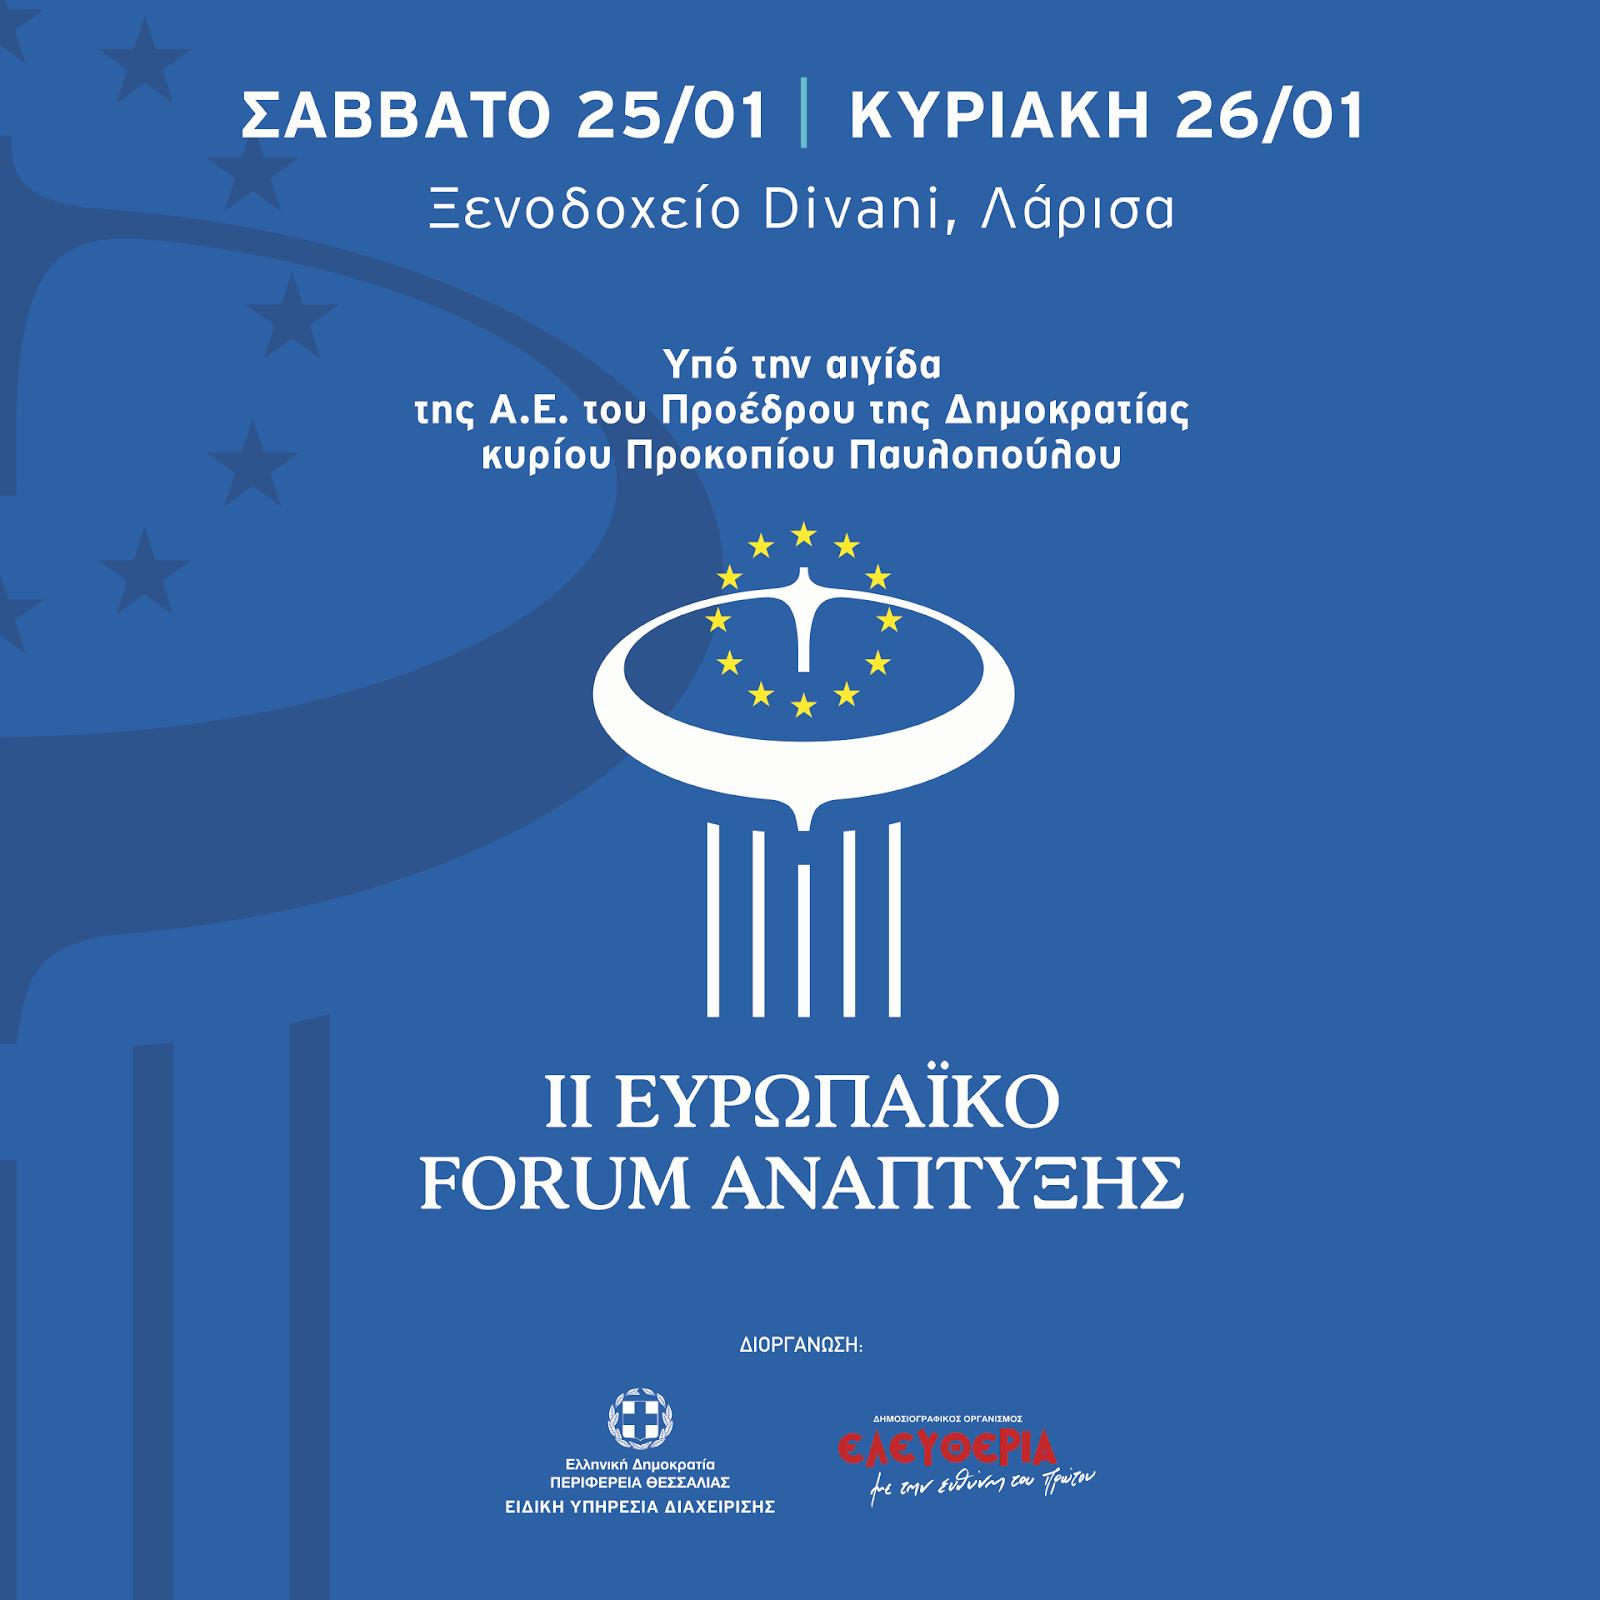 II Ευρωπαϊκό Forum Ανάπτυξης στη Λάρισα